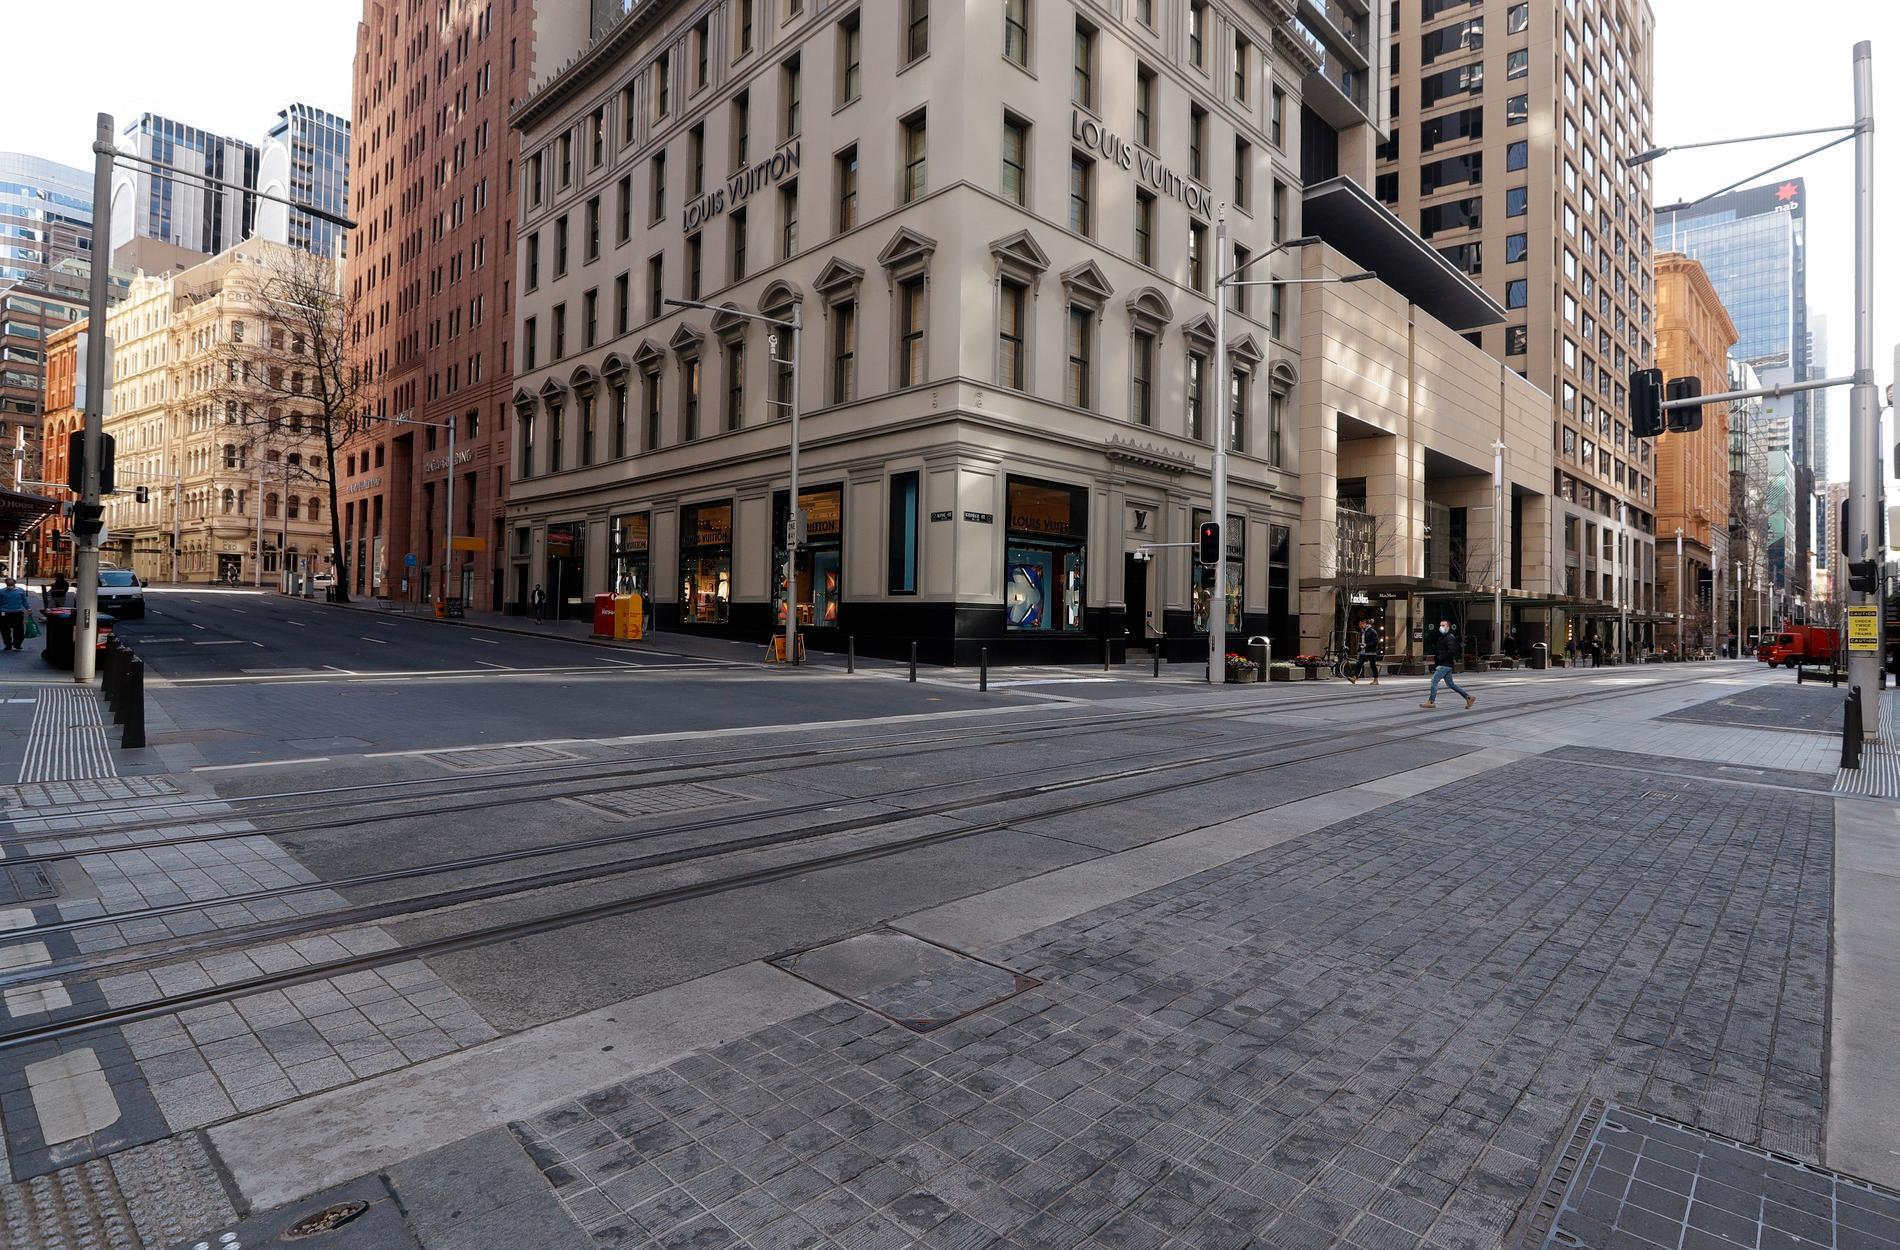 George Street, centrala Sydneys huvudgata, ekar tom.